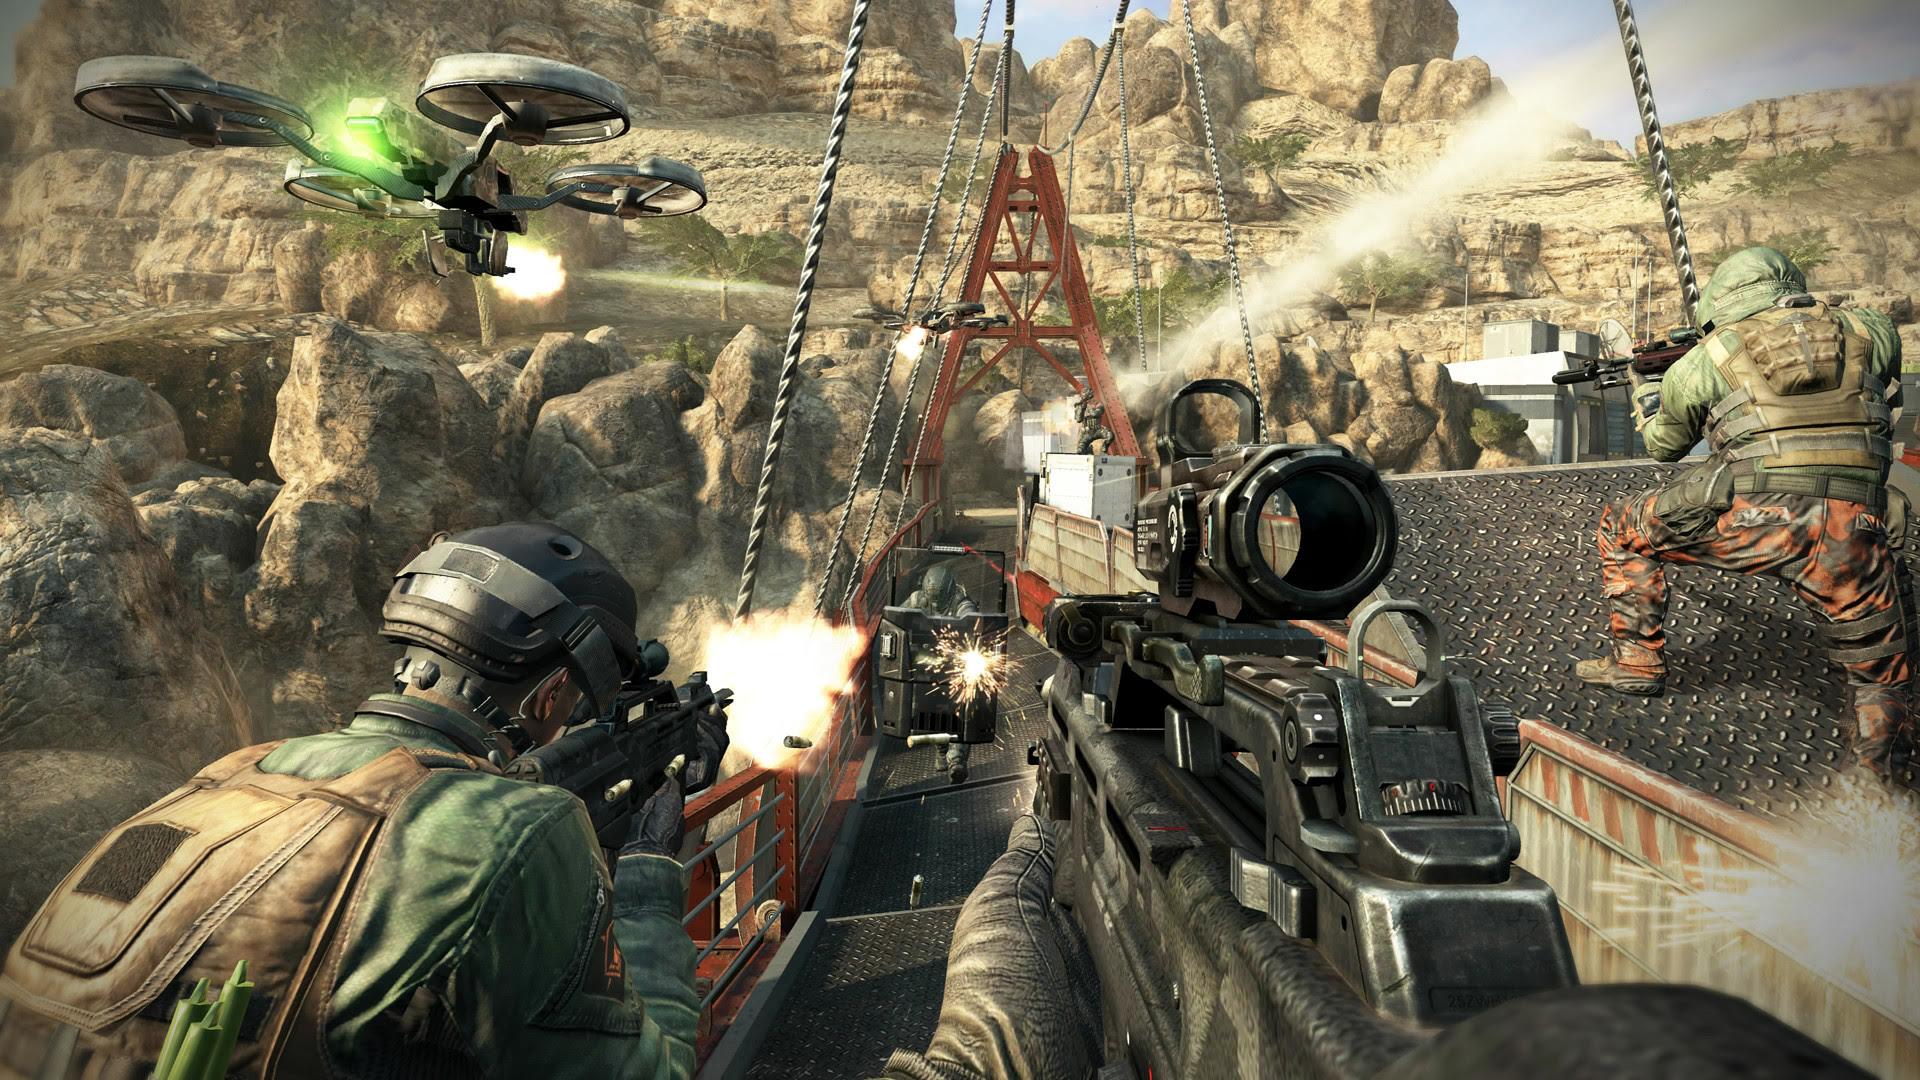 Call Of Duty Black Ops 2 Wallpaper 1920x1080 67337